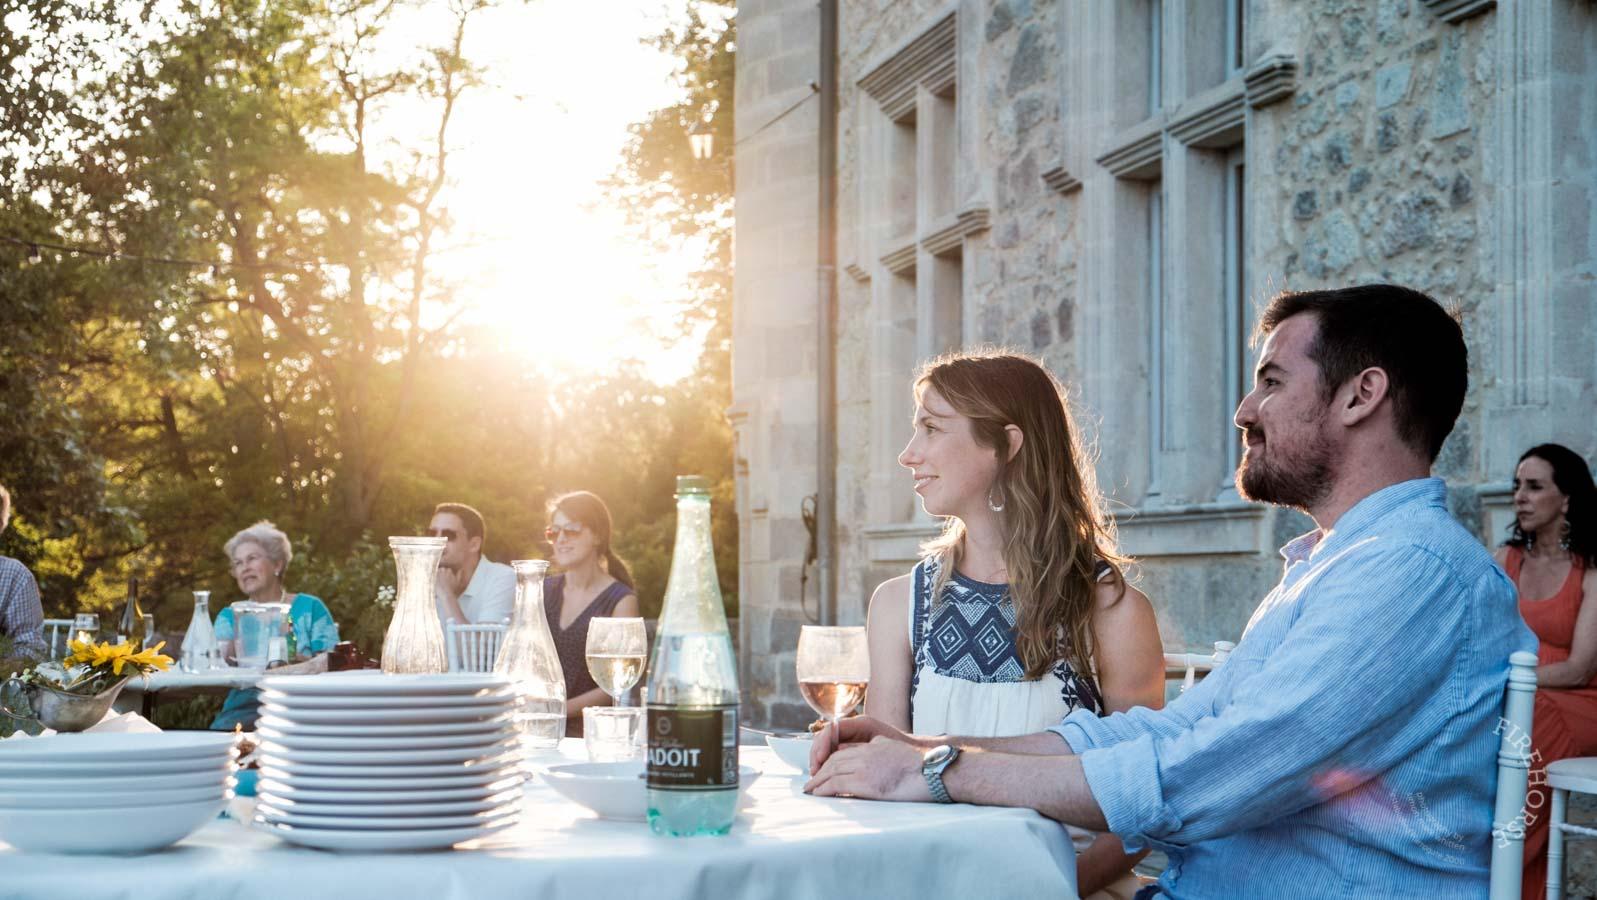 Lot-et-Garonne-Wedding-Photography-075